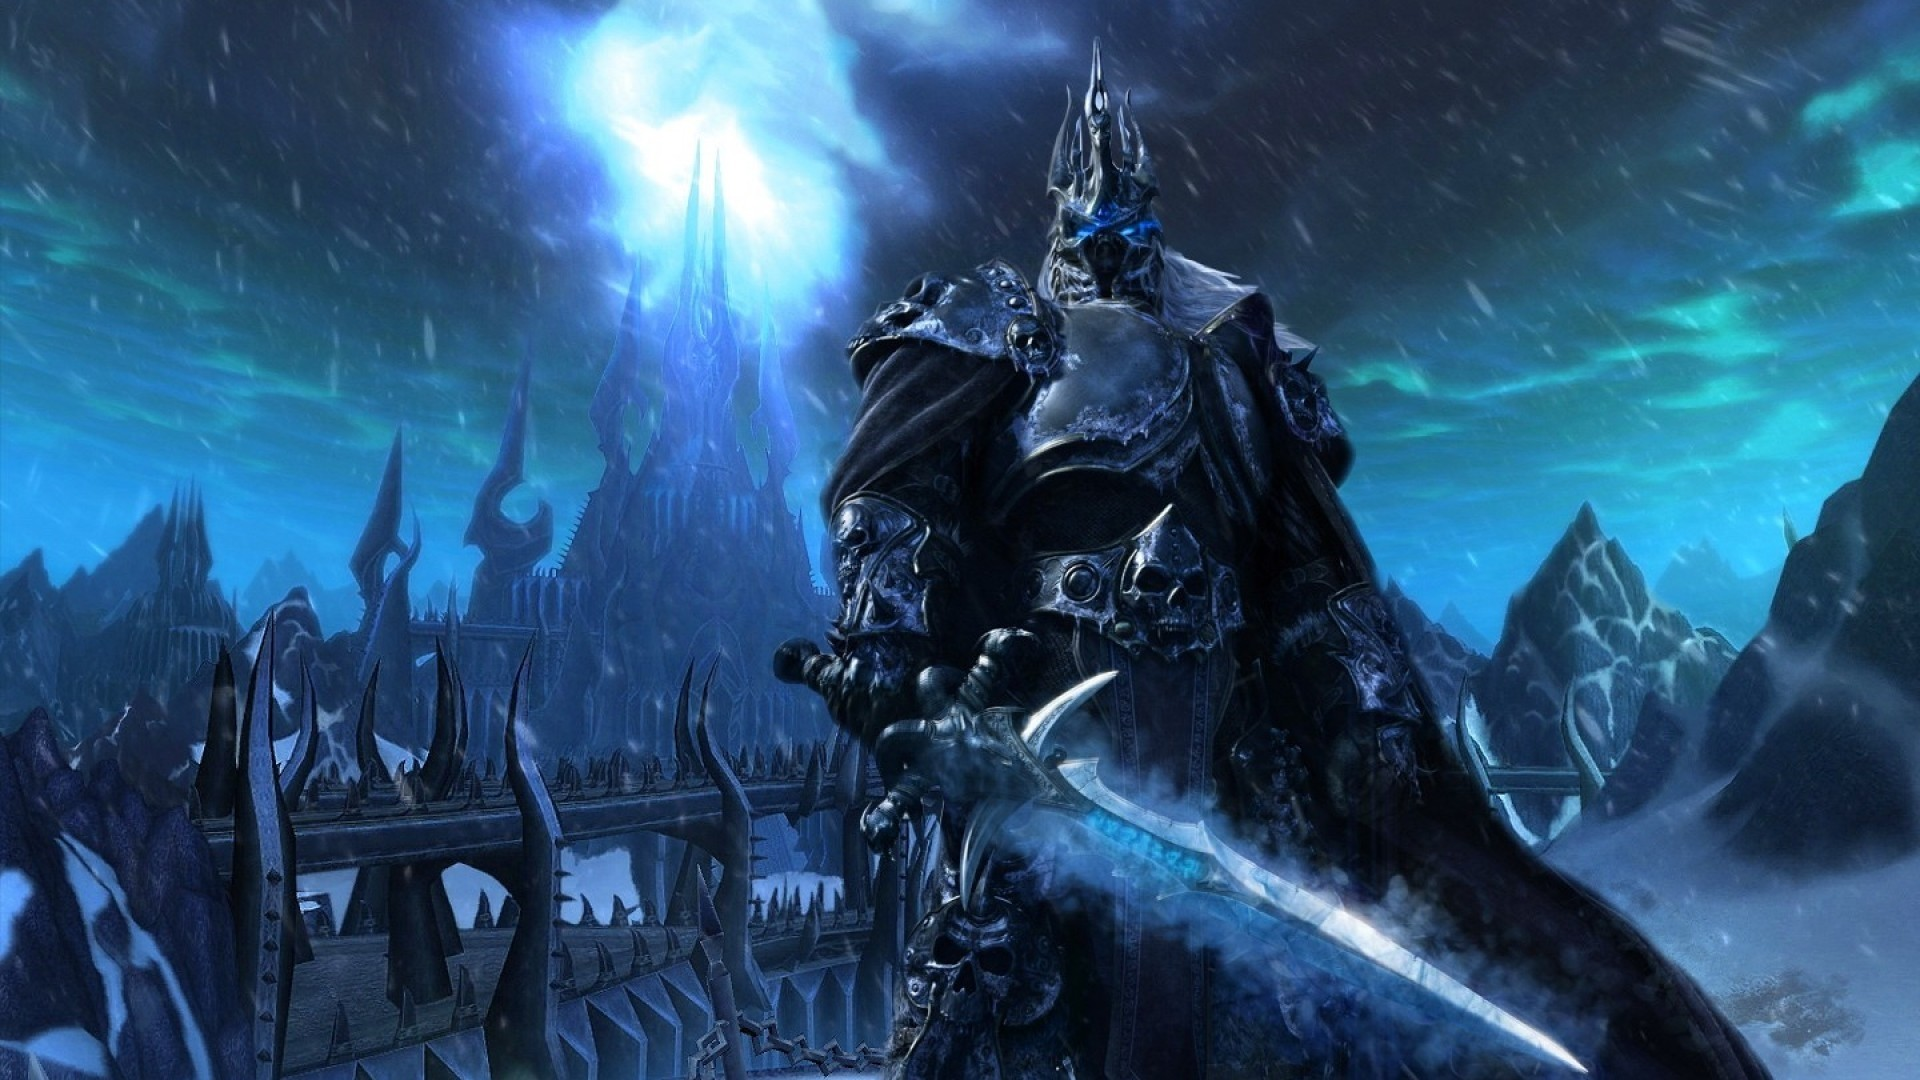 World Of Warcraft Wallpaper image hd